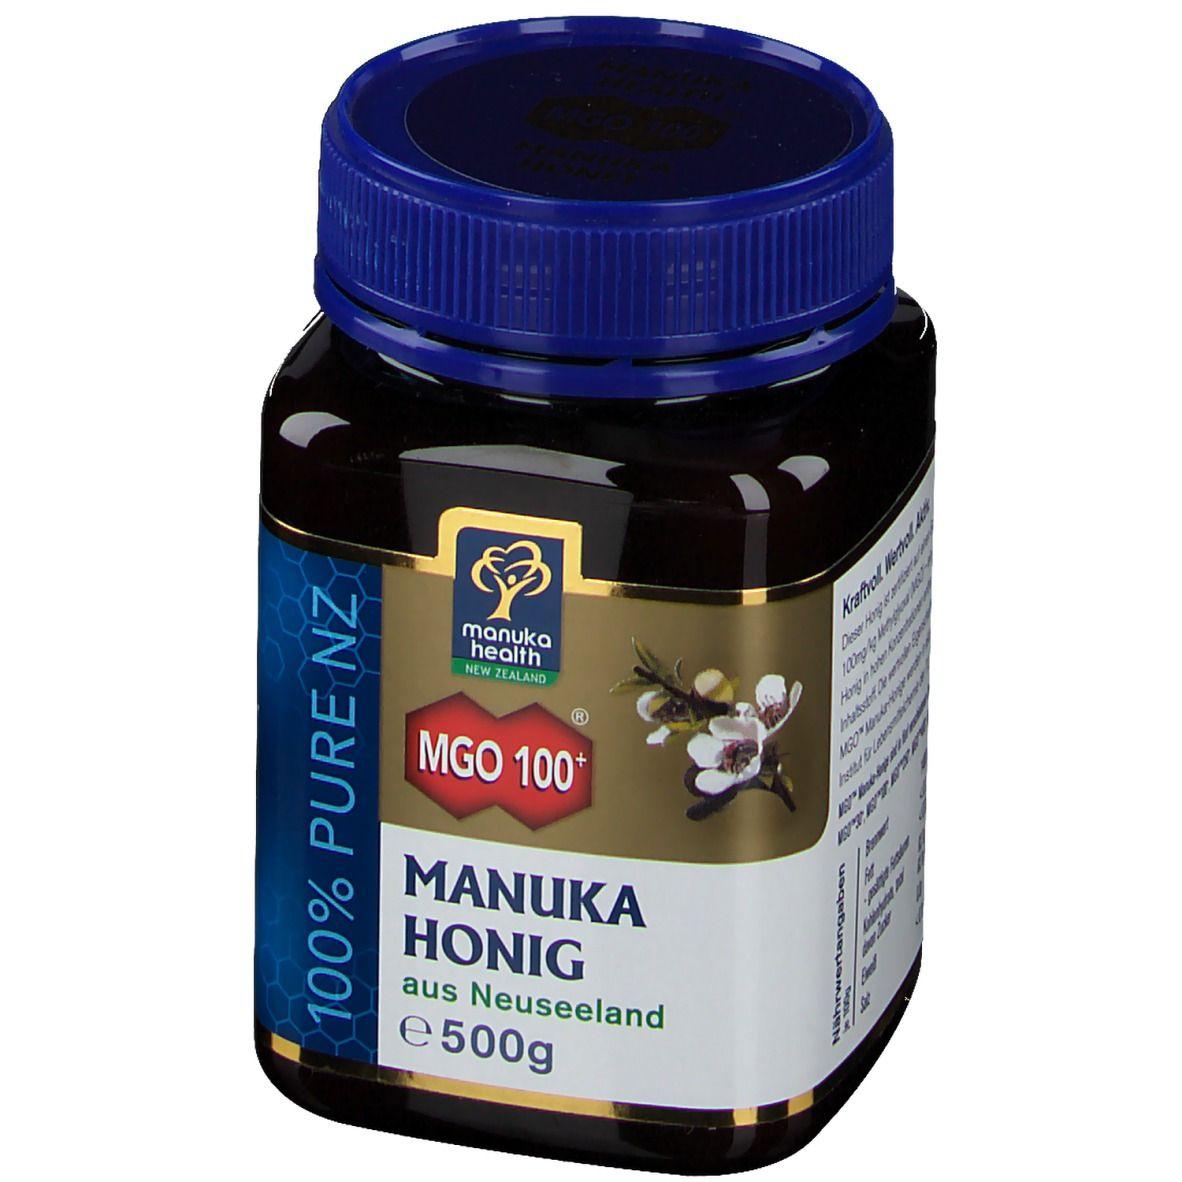 Manuka Honig Pickel